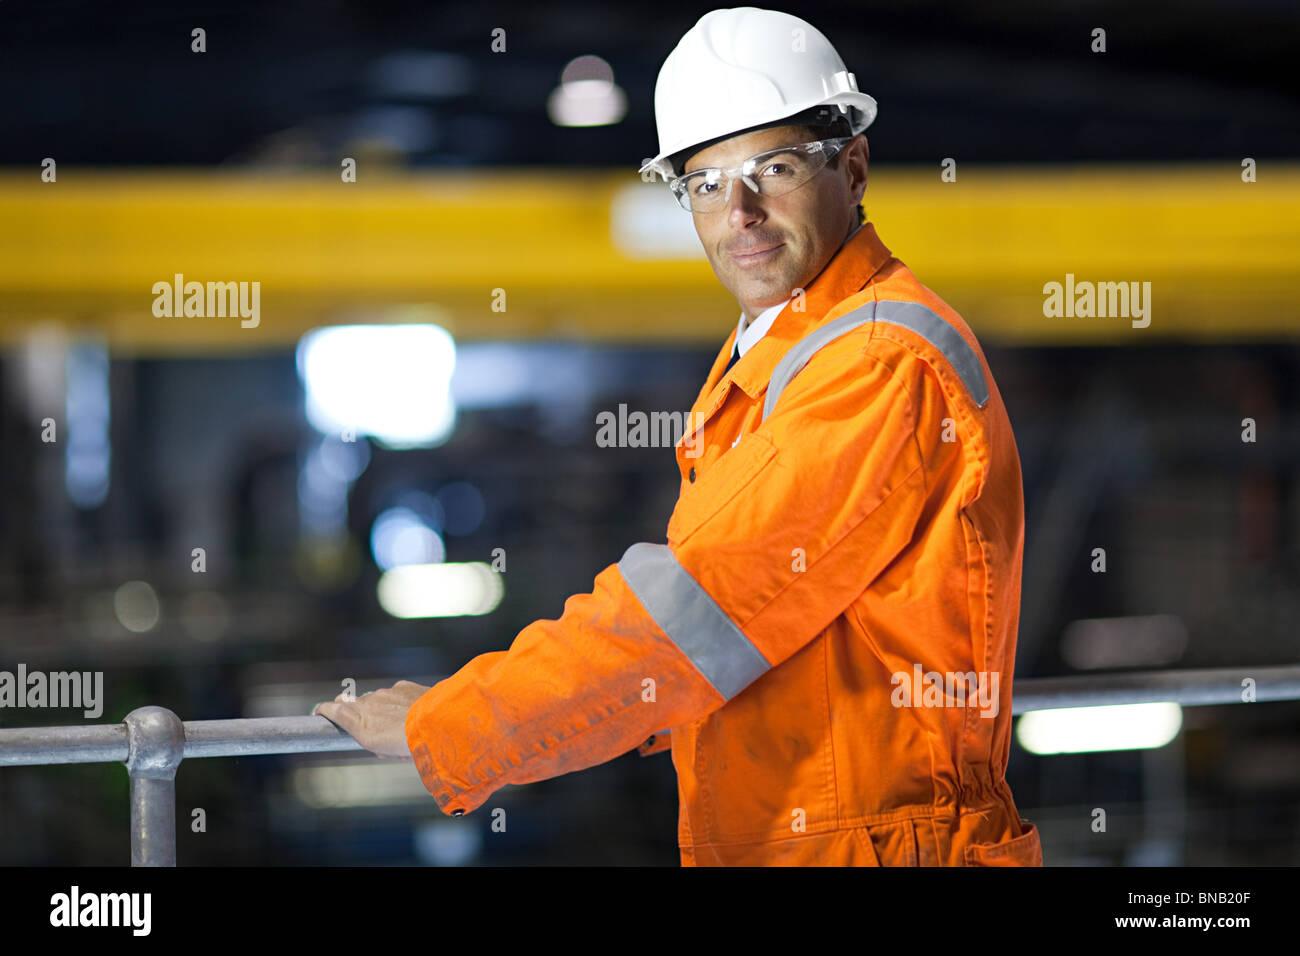 Engineer in factory - Stock Image